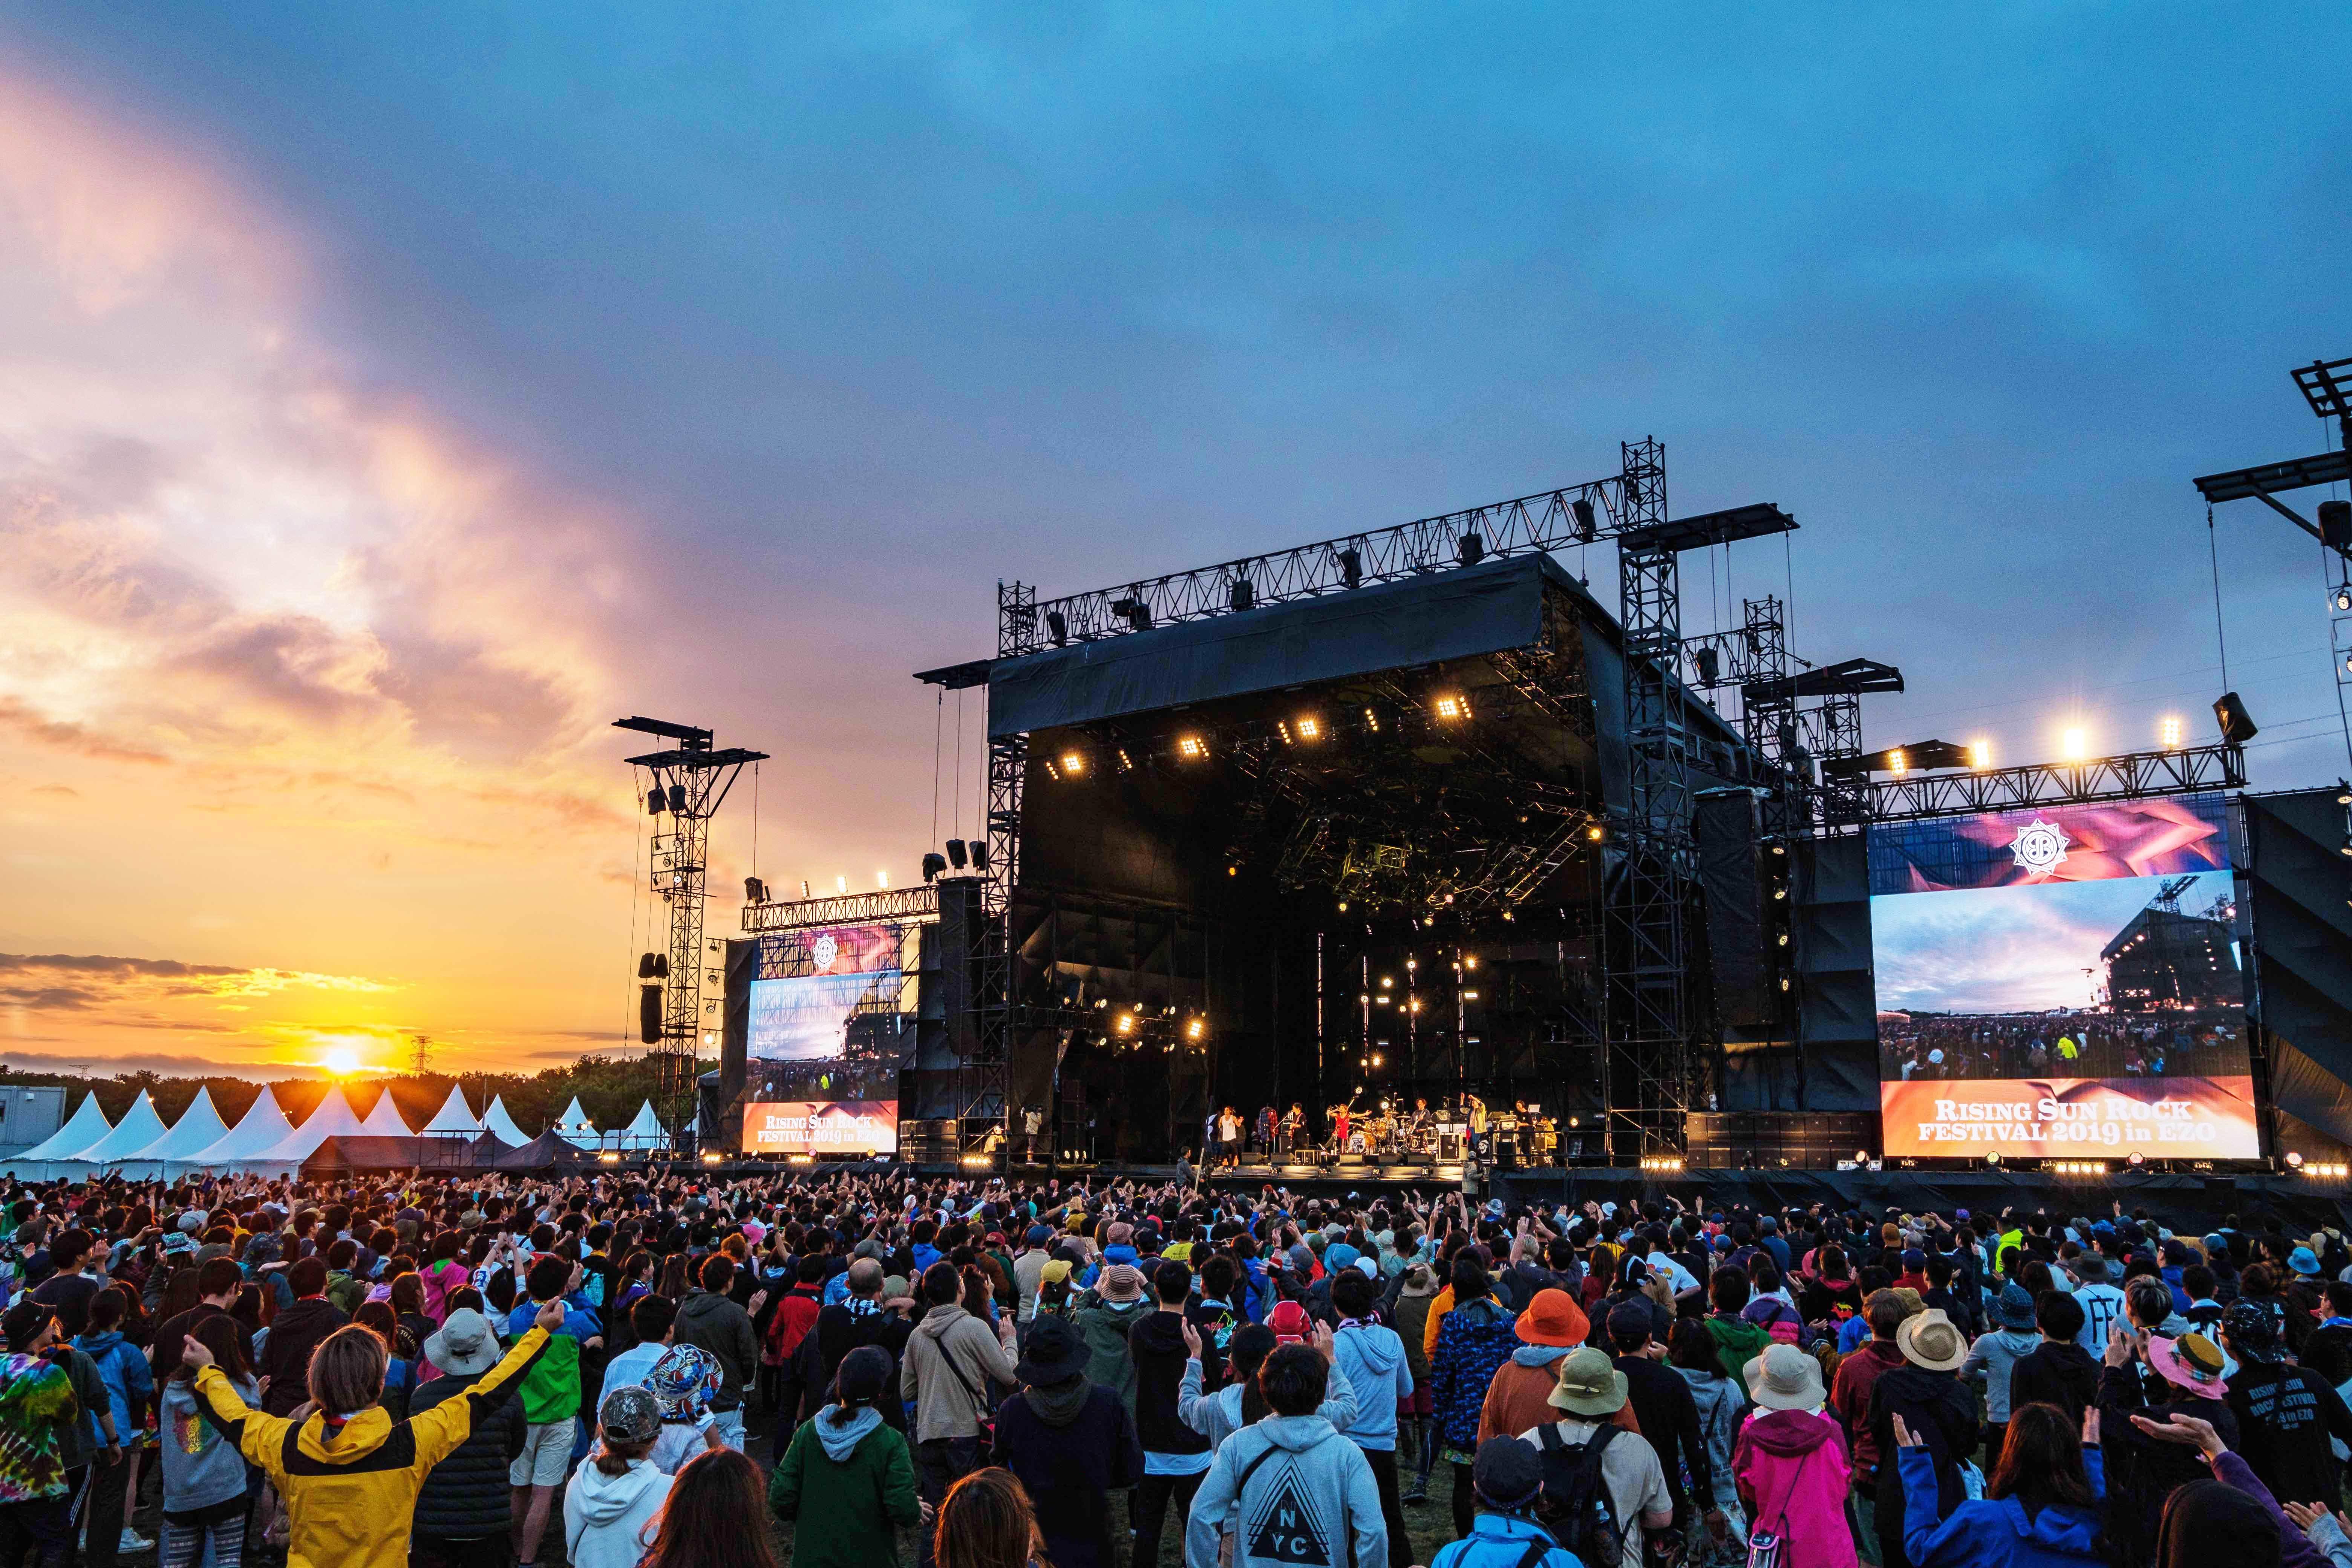 RISING SUN ROCK FESTIVAL 2020 in EZO